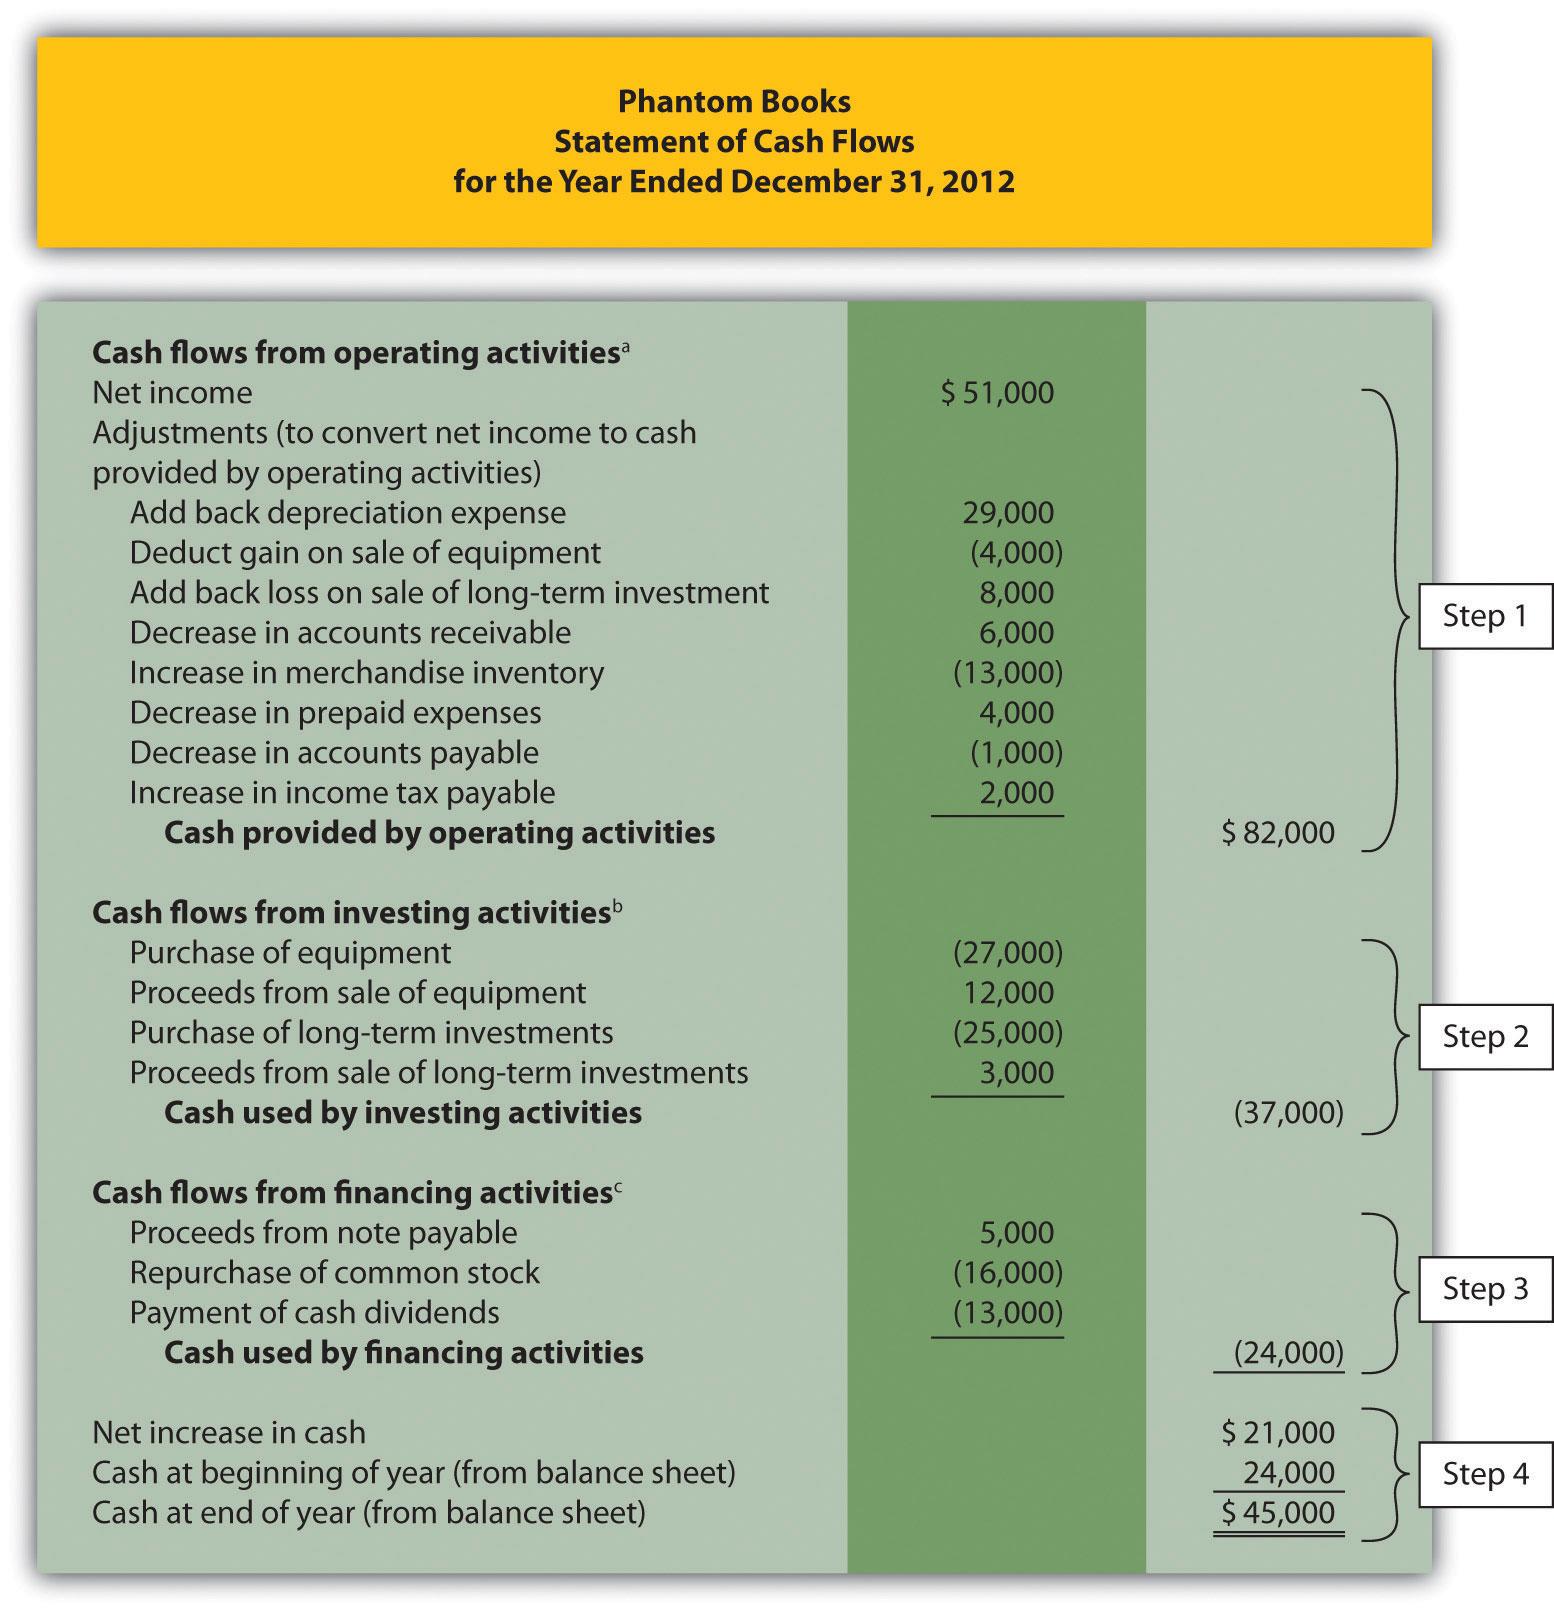 Printable Cash Flow Statement Template Indirect Method Excel With Cash Flow Statement Template Indirect Method Excel Sample